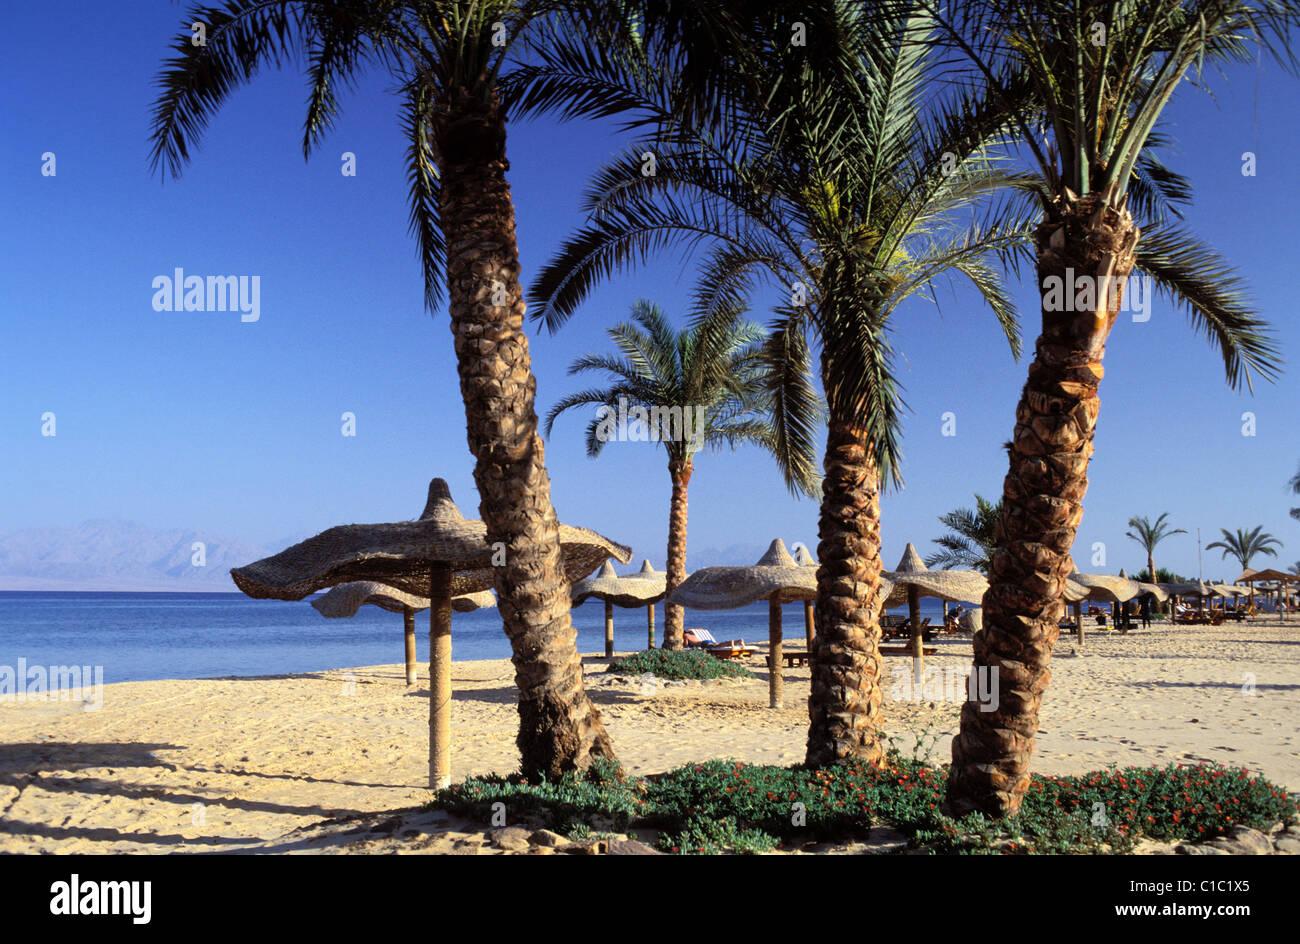 Egypt, Sinai peninsula, the beach of Nuweiba, a little seaside resort in the gulf of Aqaba - Stock Image